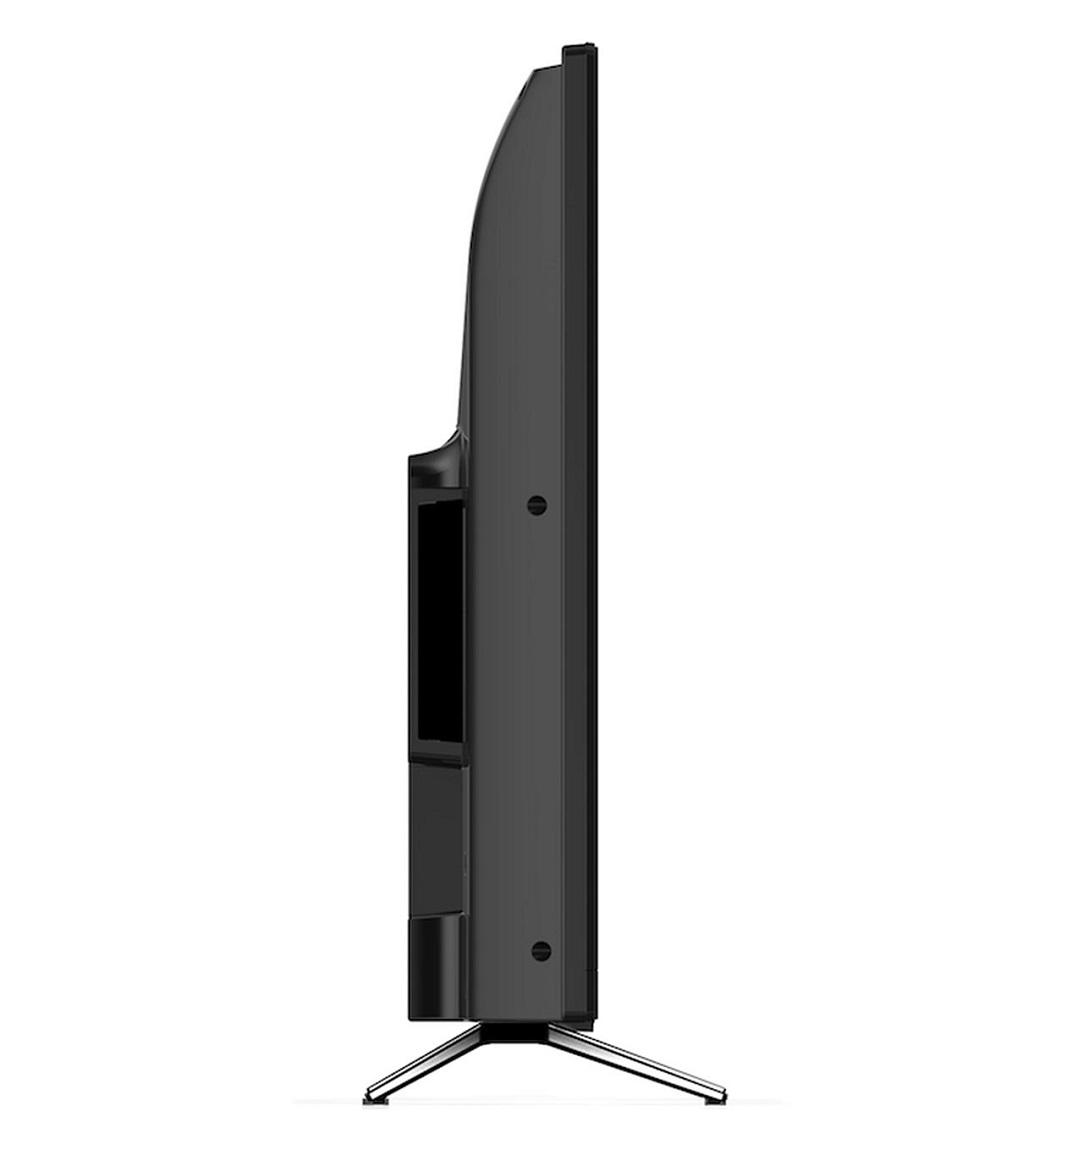 philips led 34 inch manual bdm3270